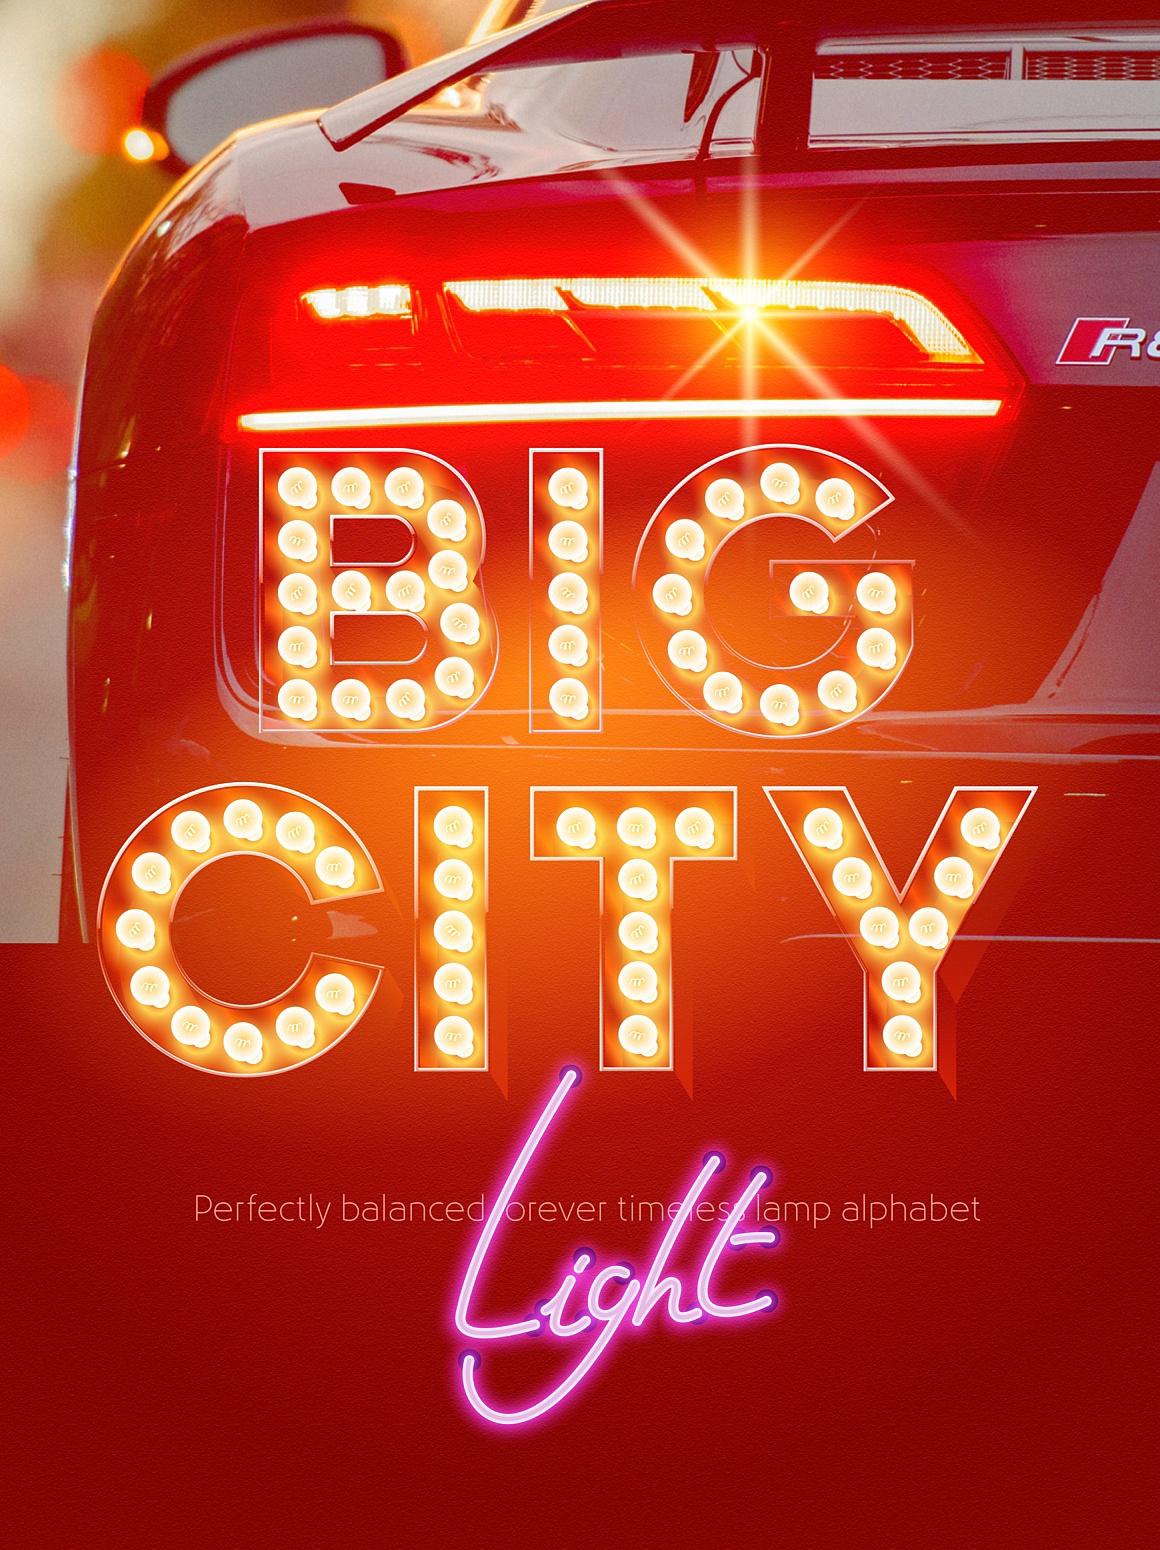 3d Lamp Classic images/promo-Old-bulp-lamp-alphabet-red_3.jpg